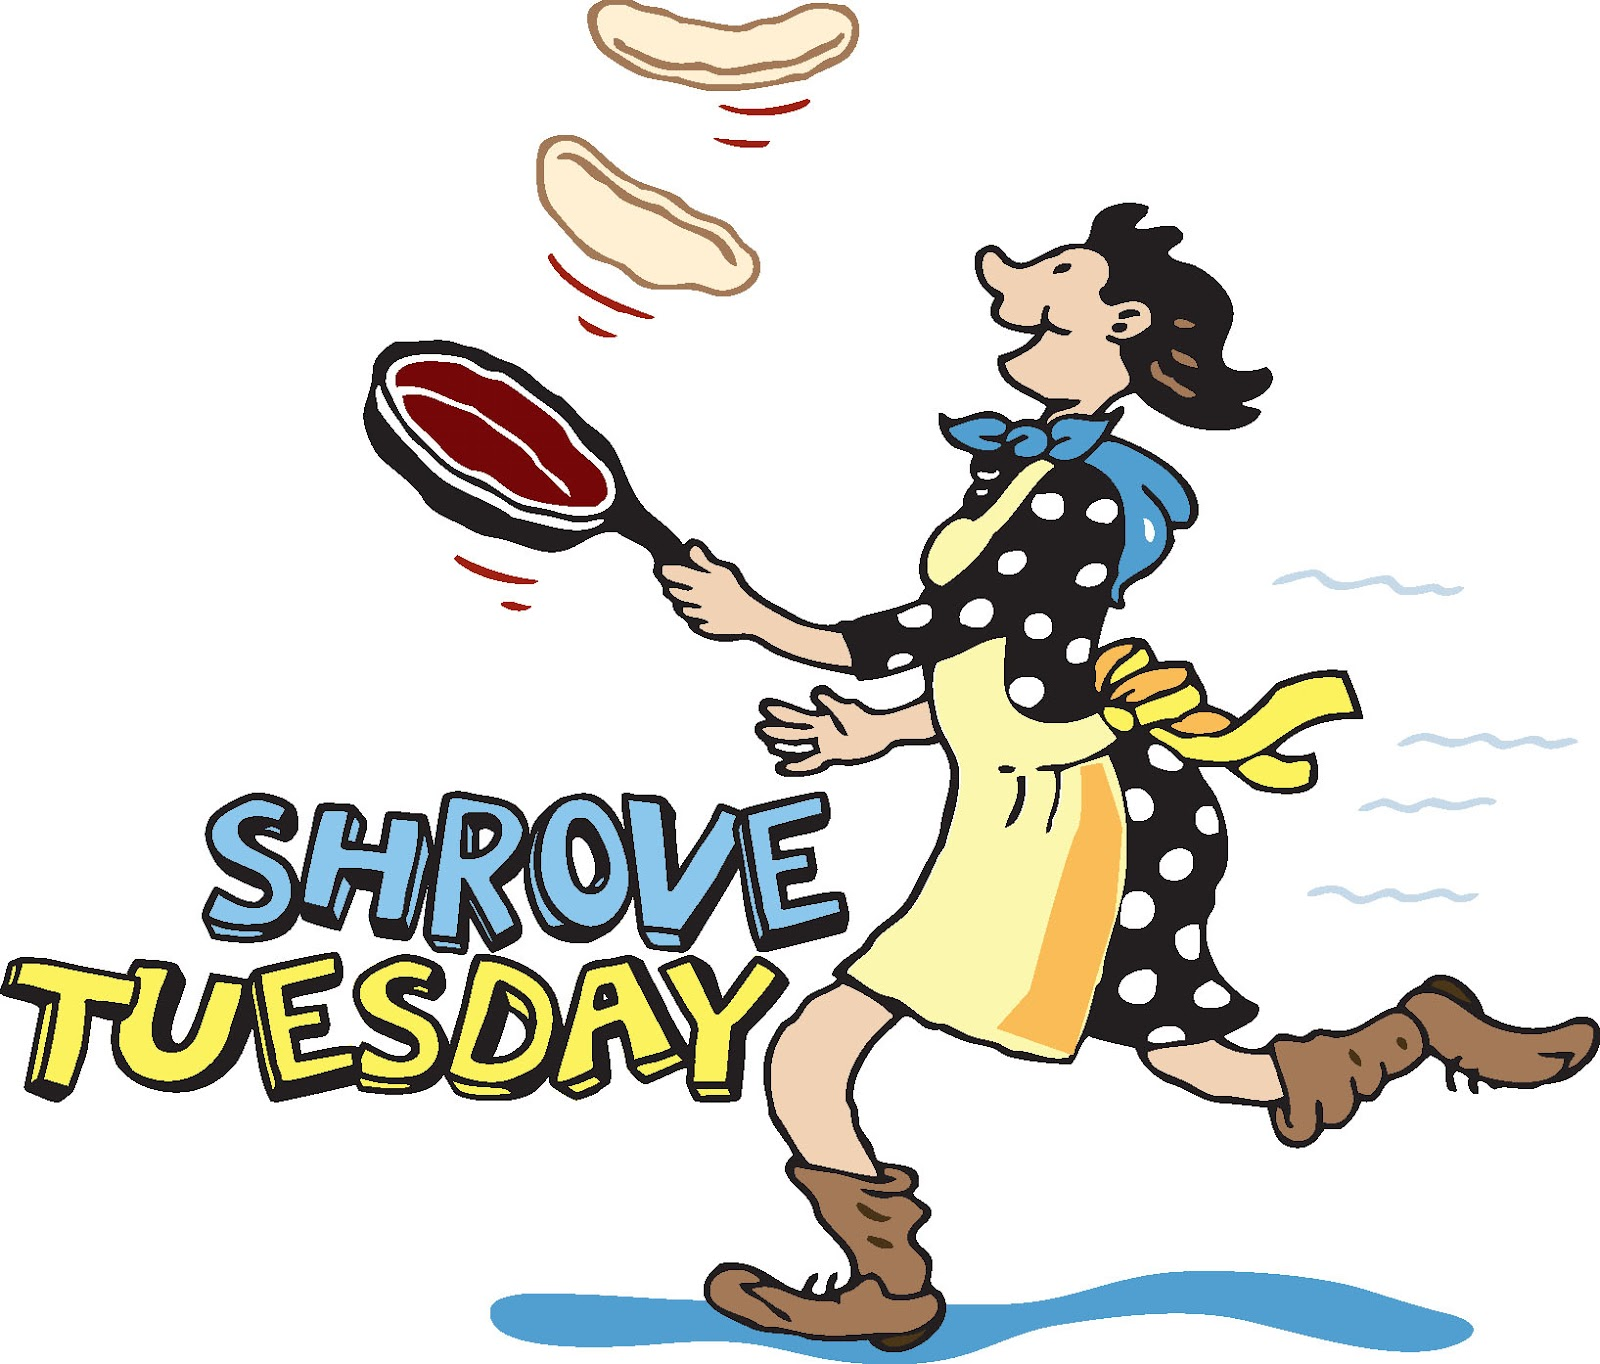 Pancake Shrove Tuesday Clip Art N3 free image.